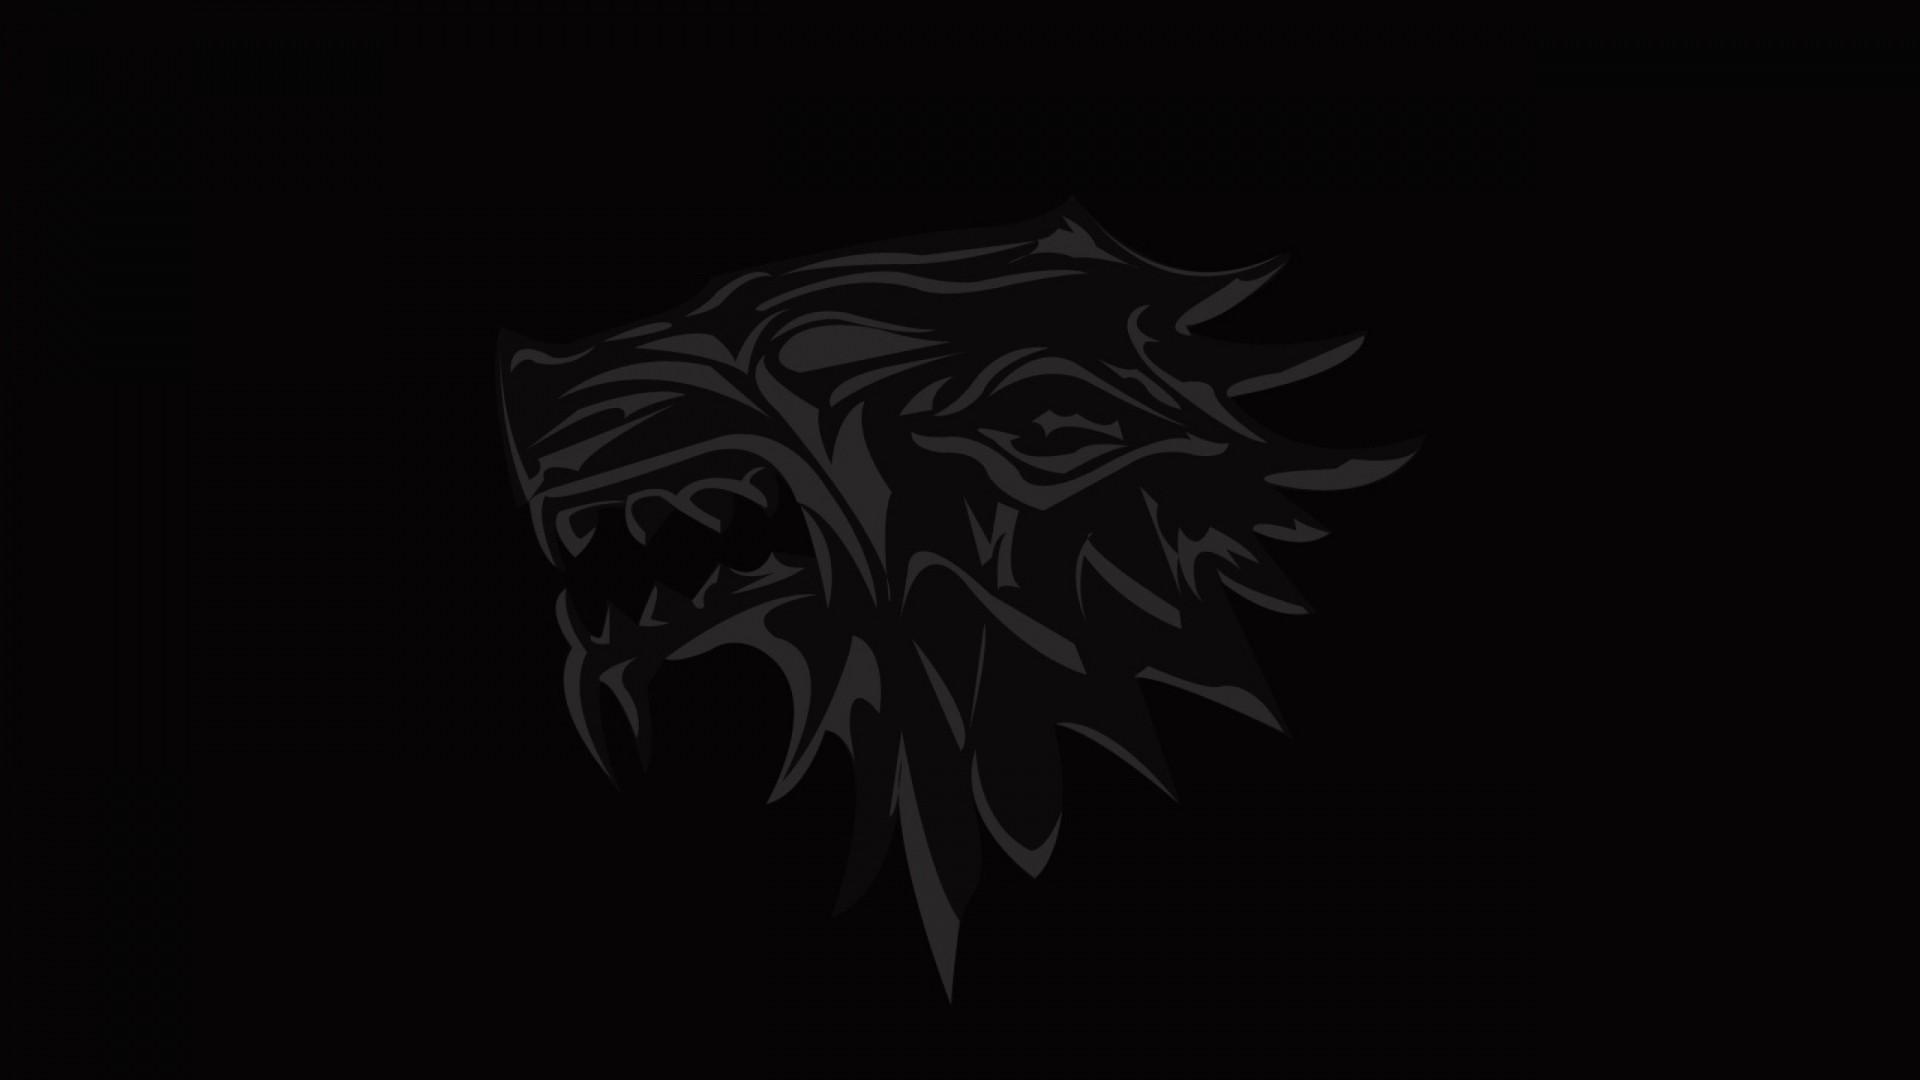 Wallpaper house of stark, game of thrones, logo, emblem, wolf